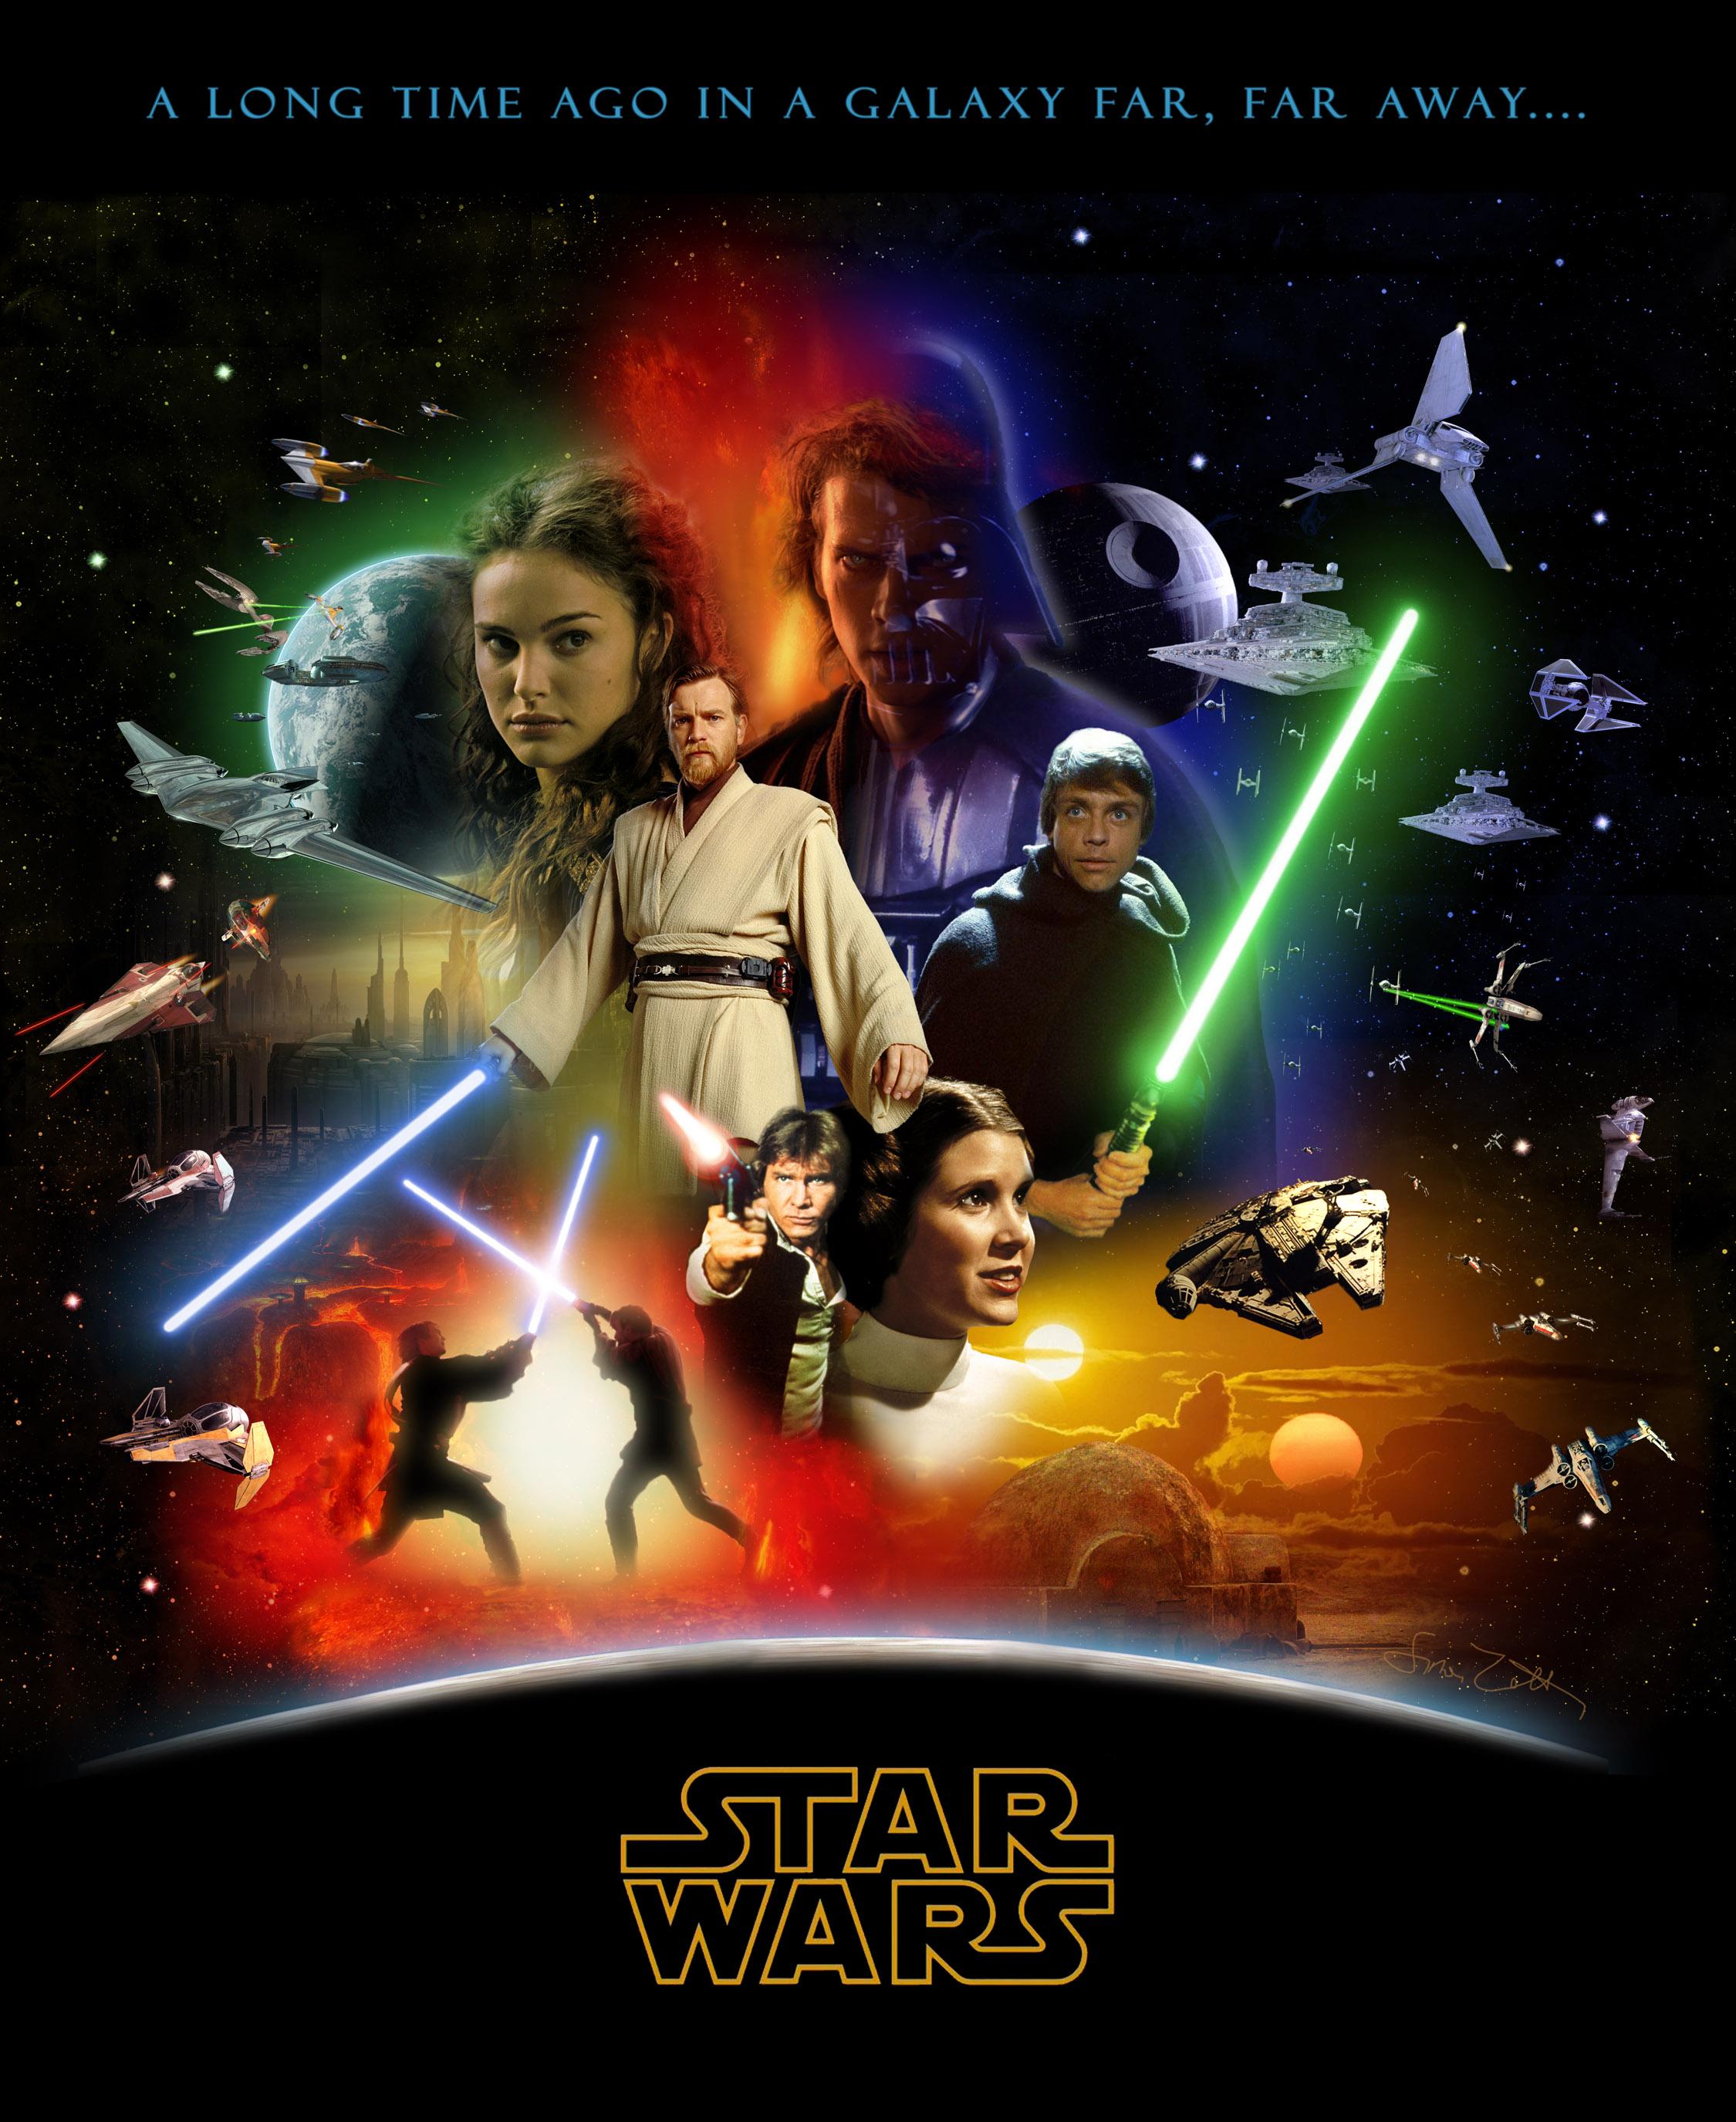 Star Wars Saga Poster 2